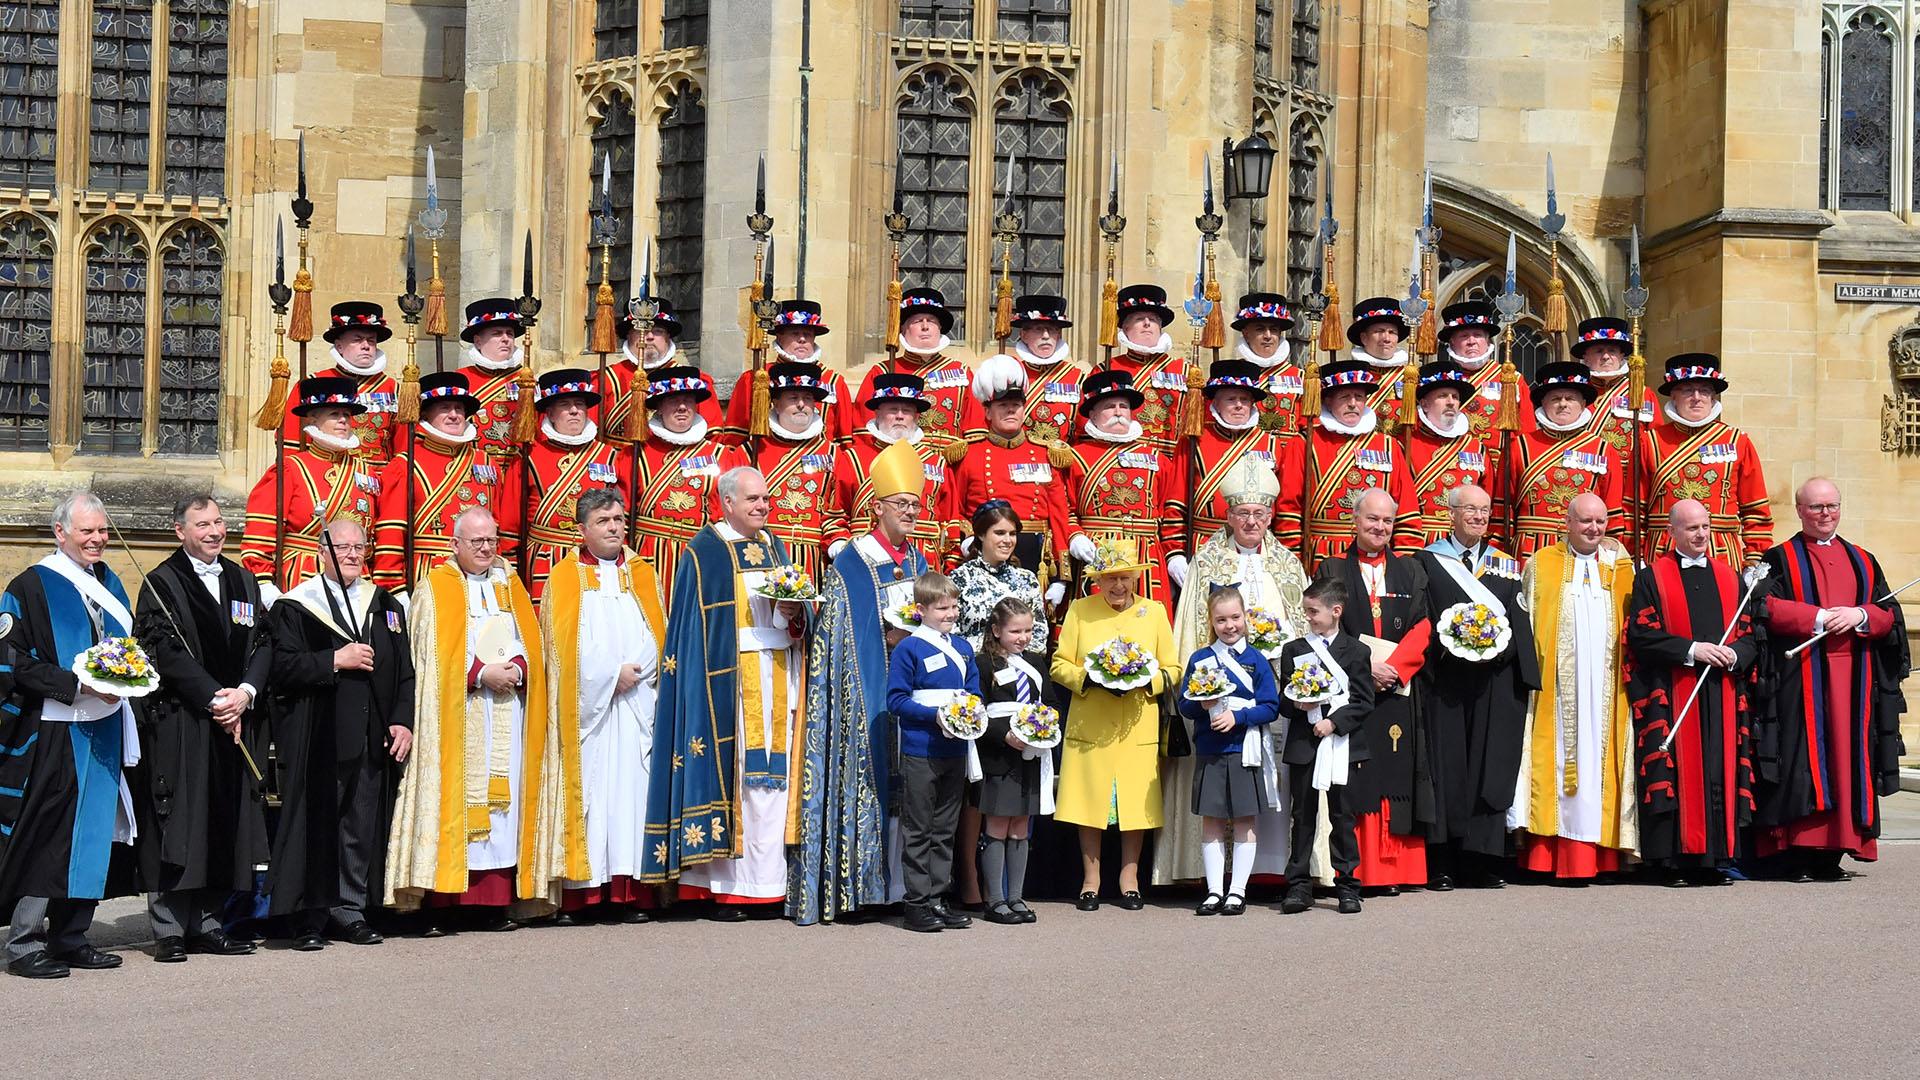 La reina eligió un look monocromo amarillo